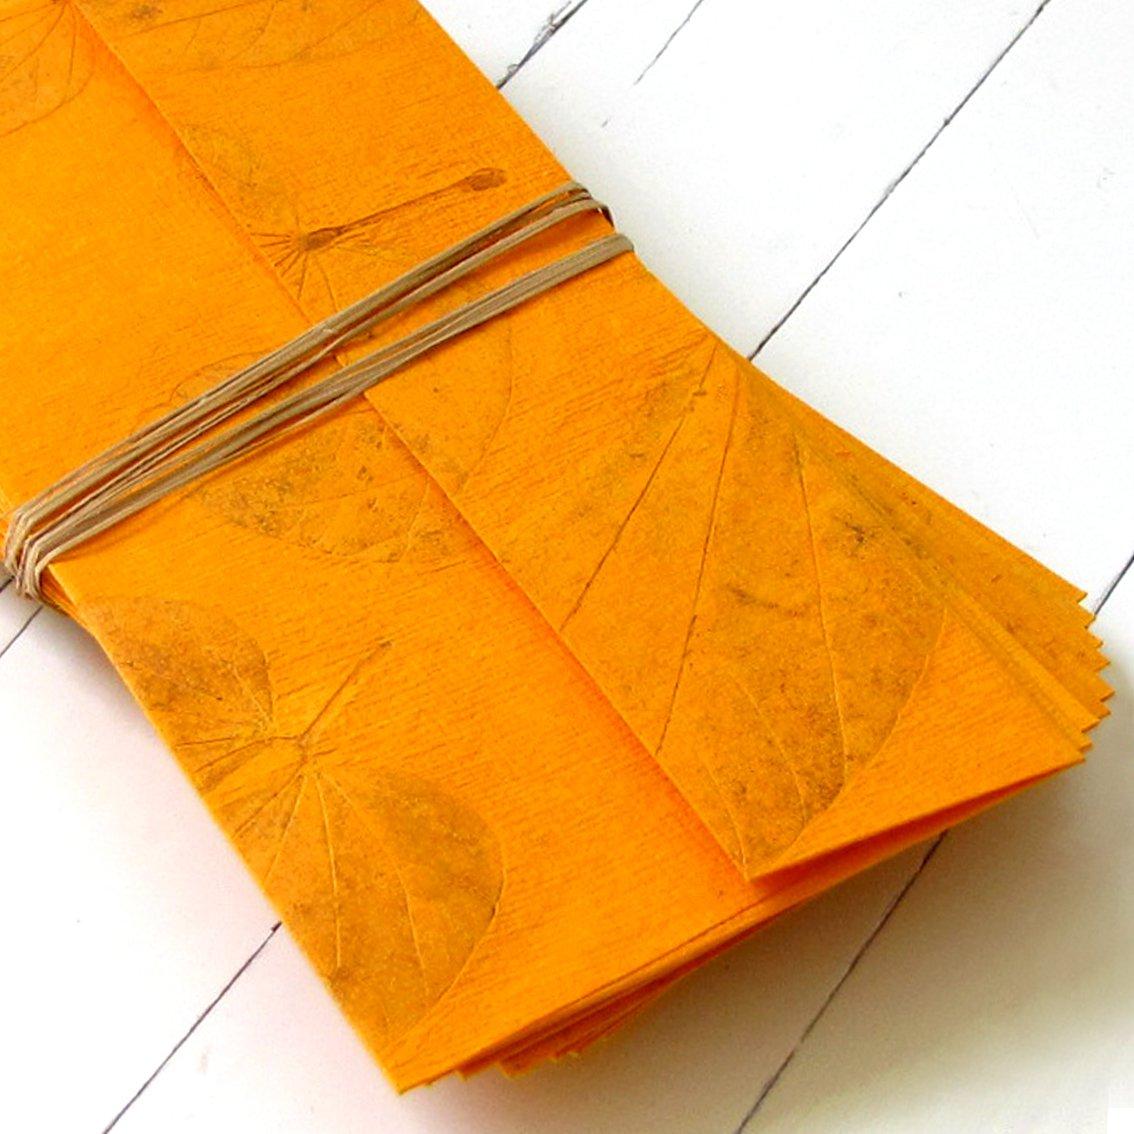 Handmade letter paper set 10 recycled tree free stationery light orange